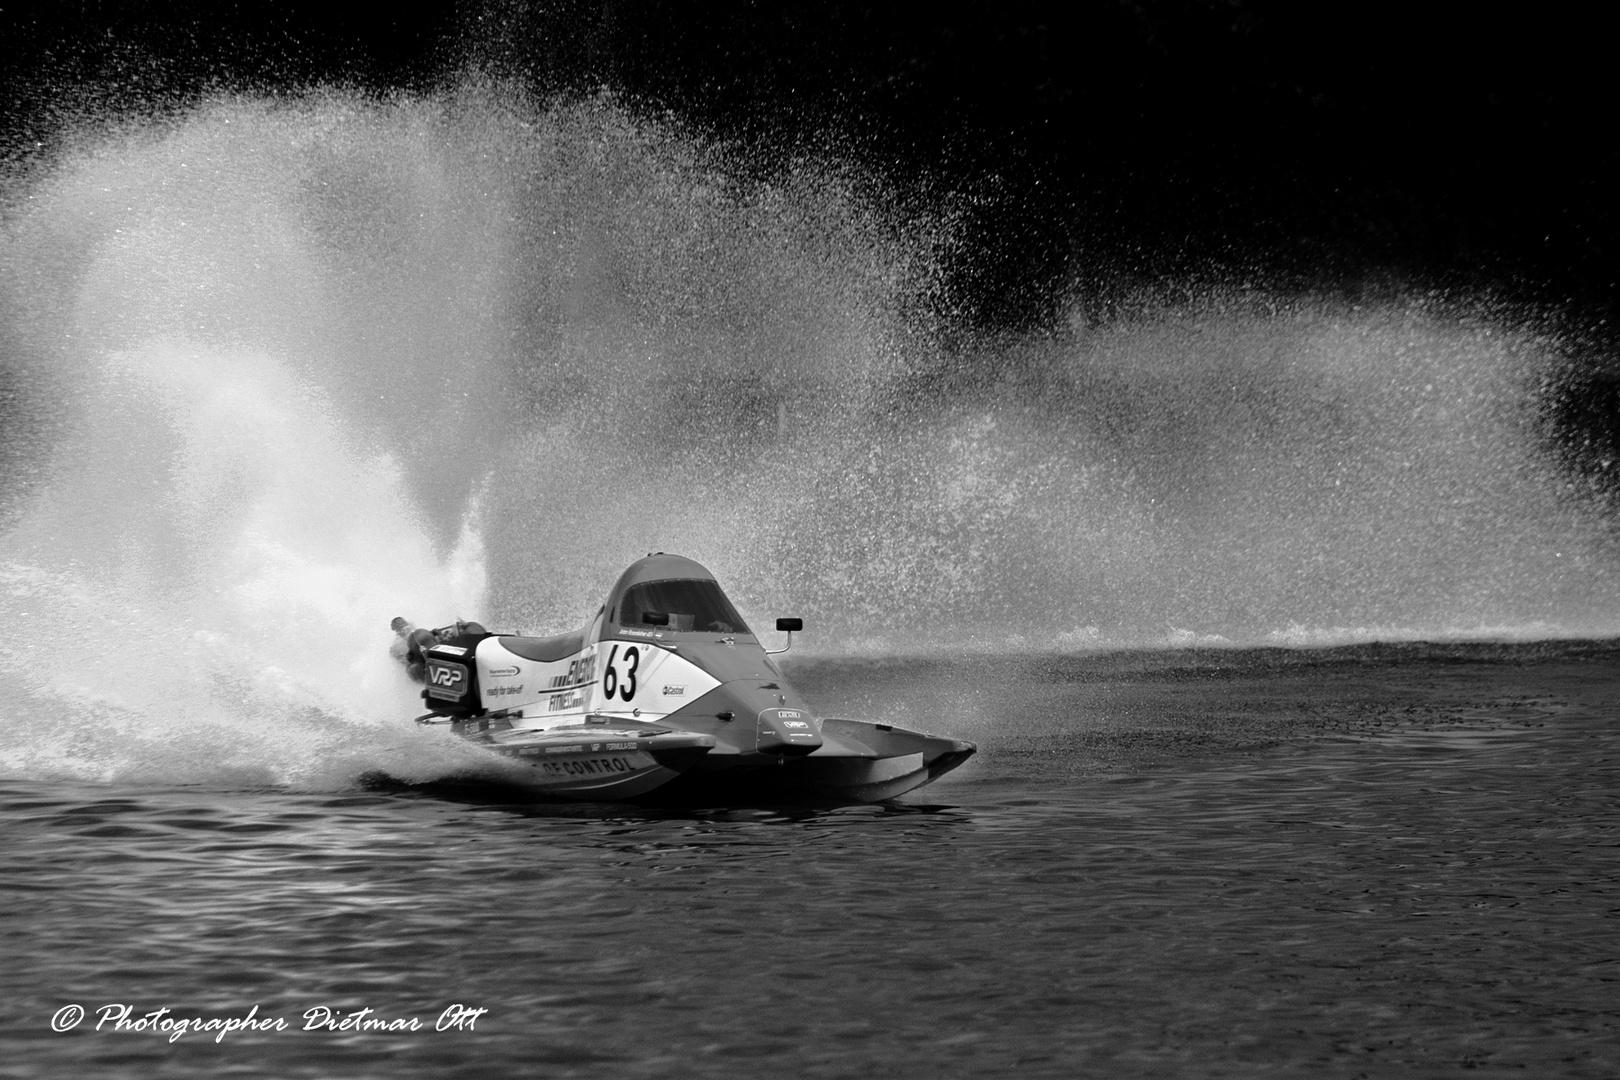 speed ....